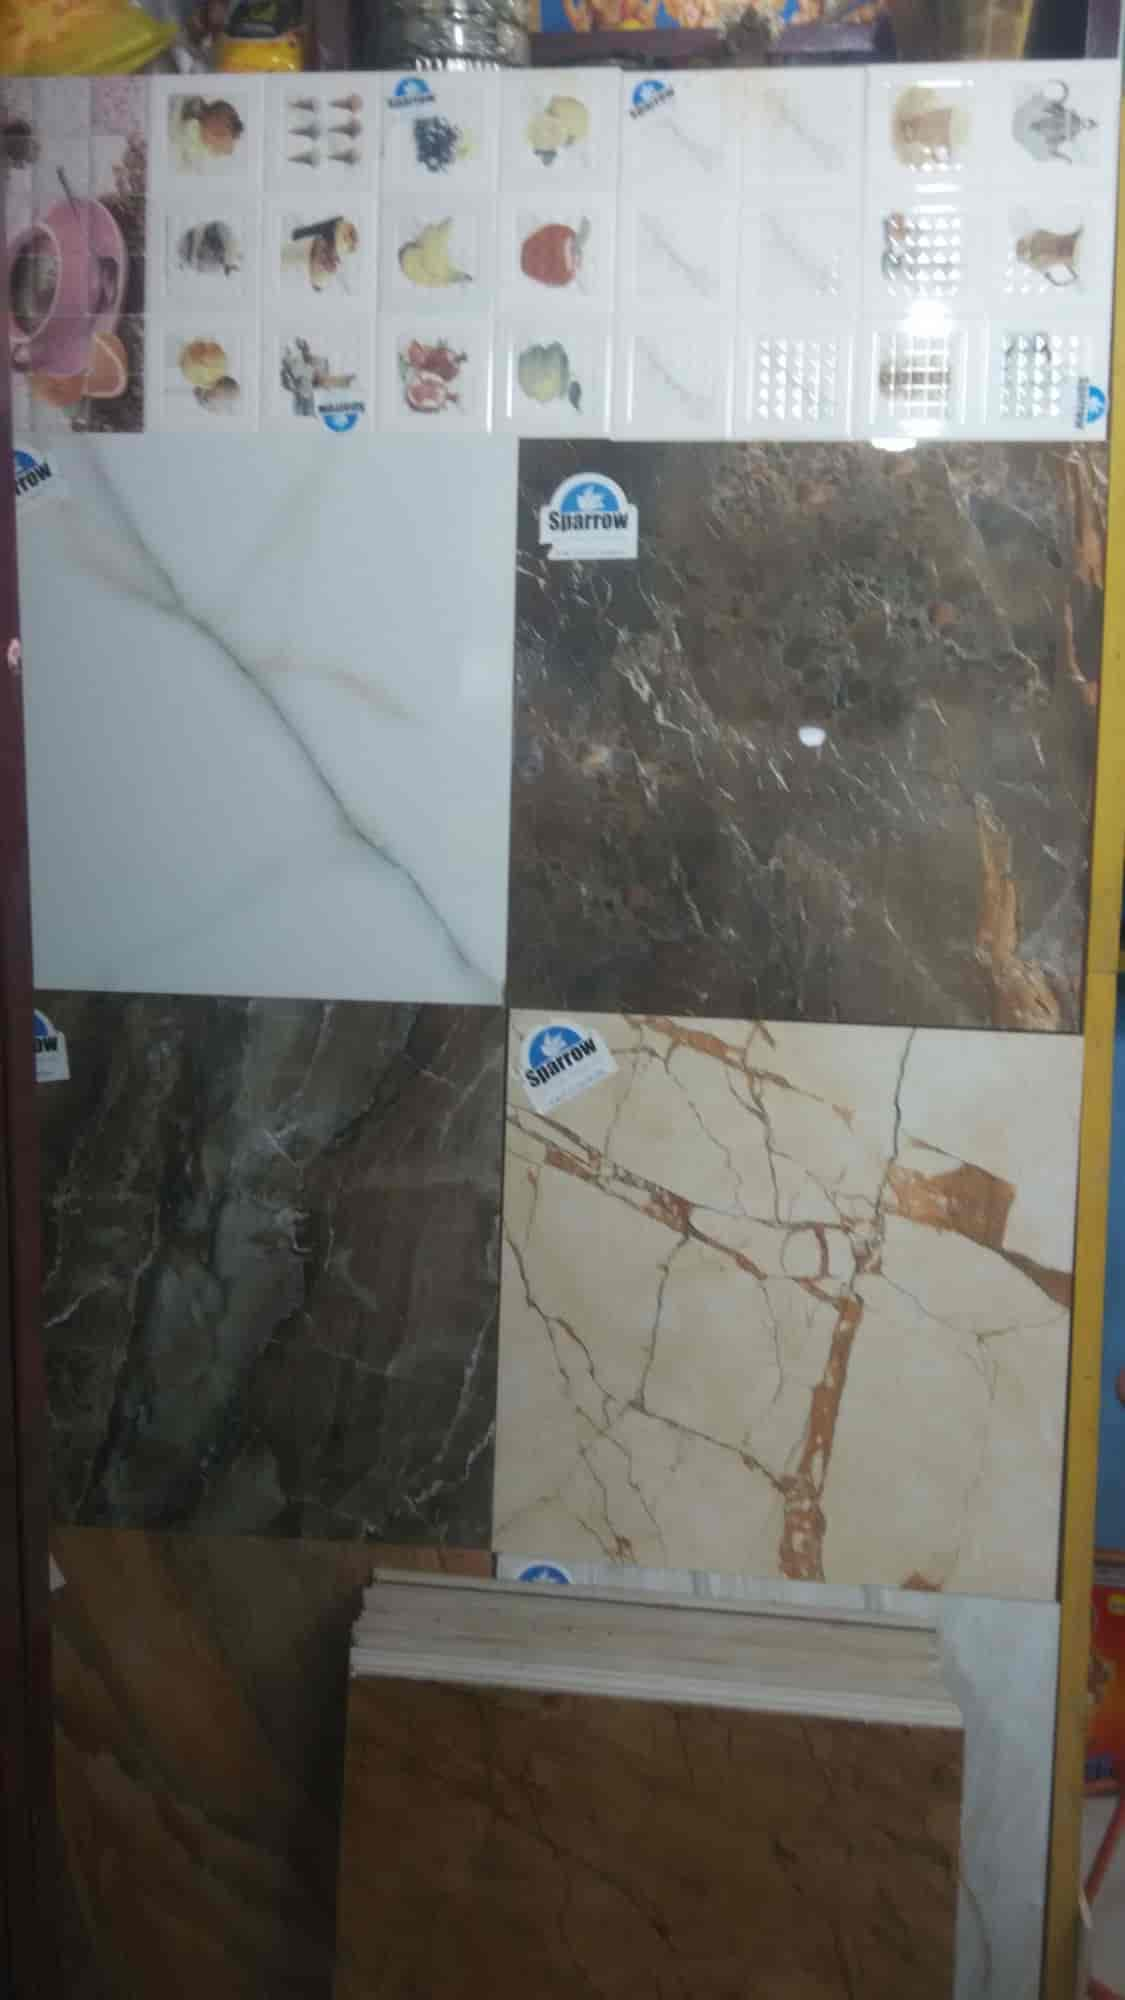 Amman Trading Company Photos, Alwarthirunagar, Chennai- Pictures ...